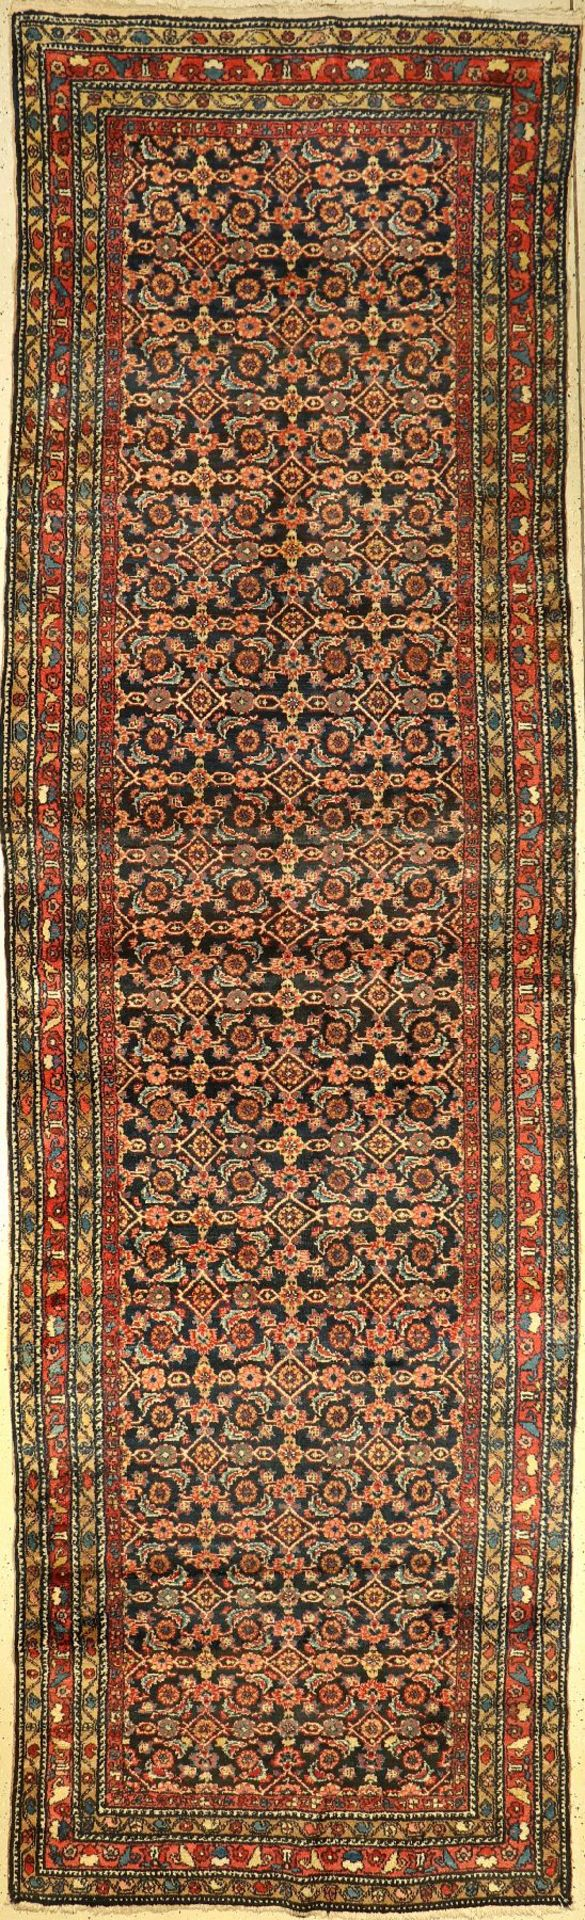 Hamadan, Persien, um 1940, Wolle auf Baumwolle, ca. 440 x 126 cm, EHZ: 3Hamadan, Persia, around